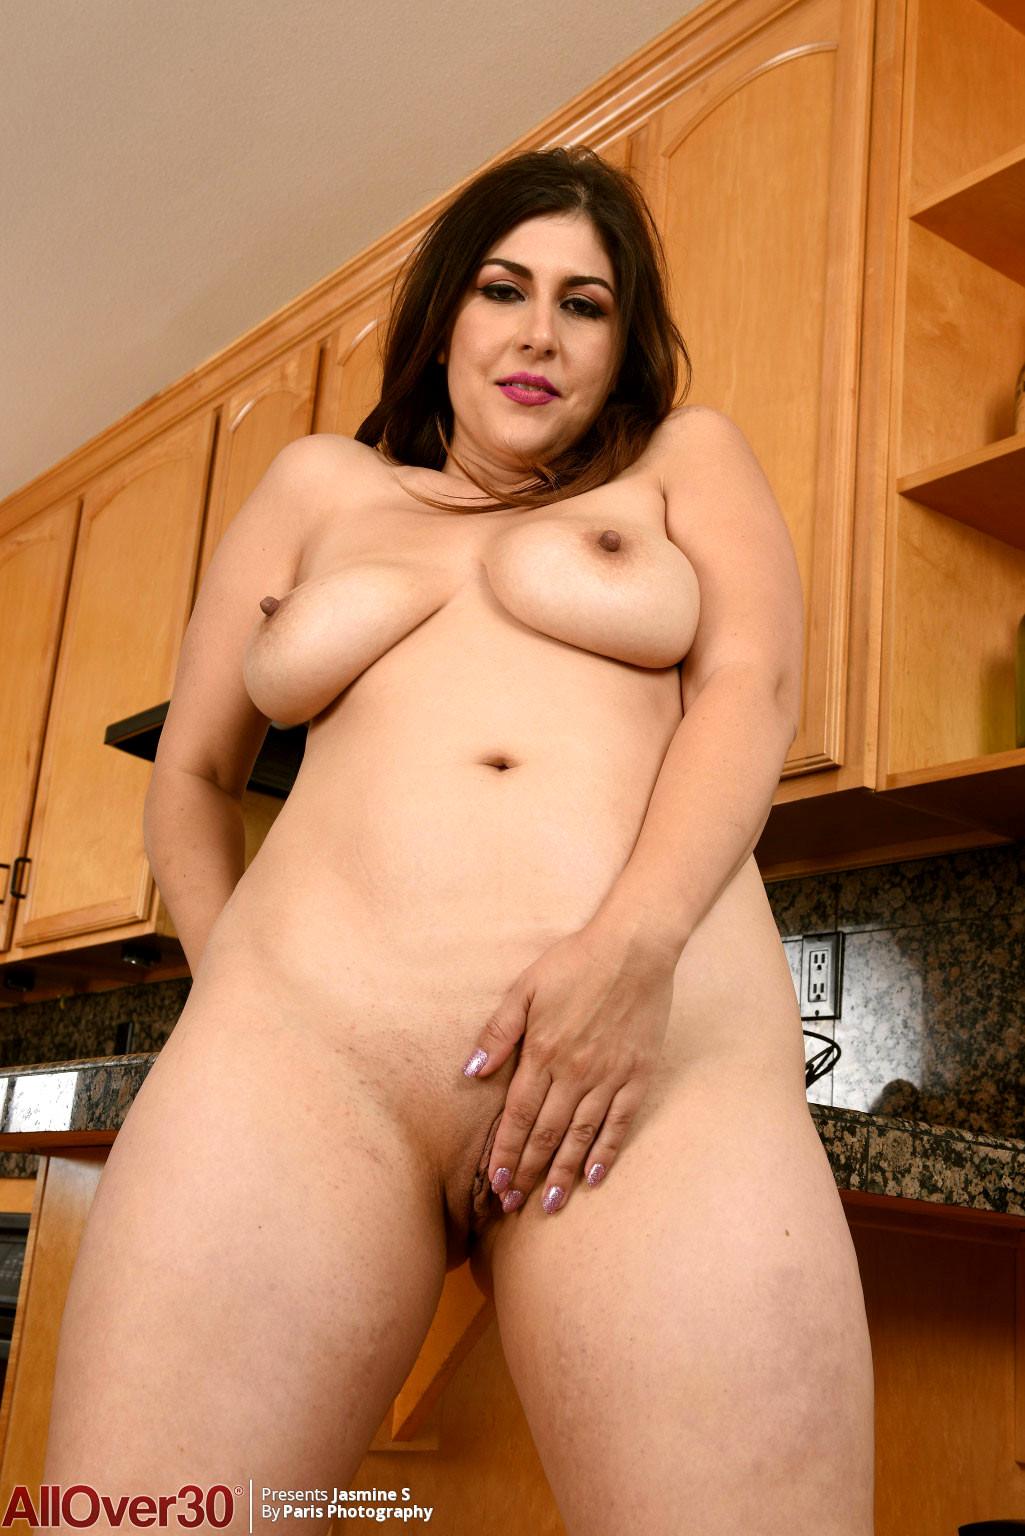 Gynastic beautiful women nude